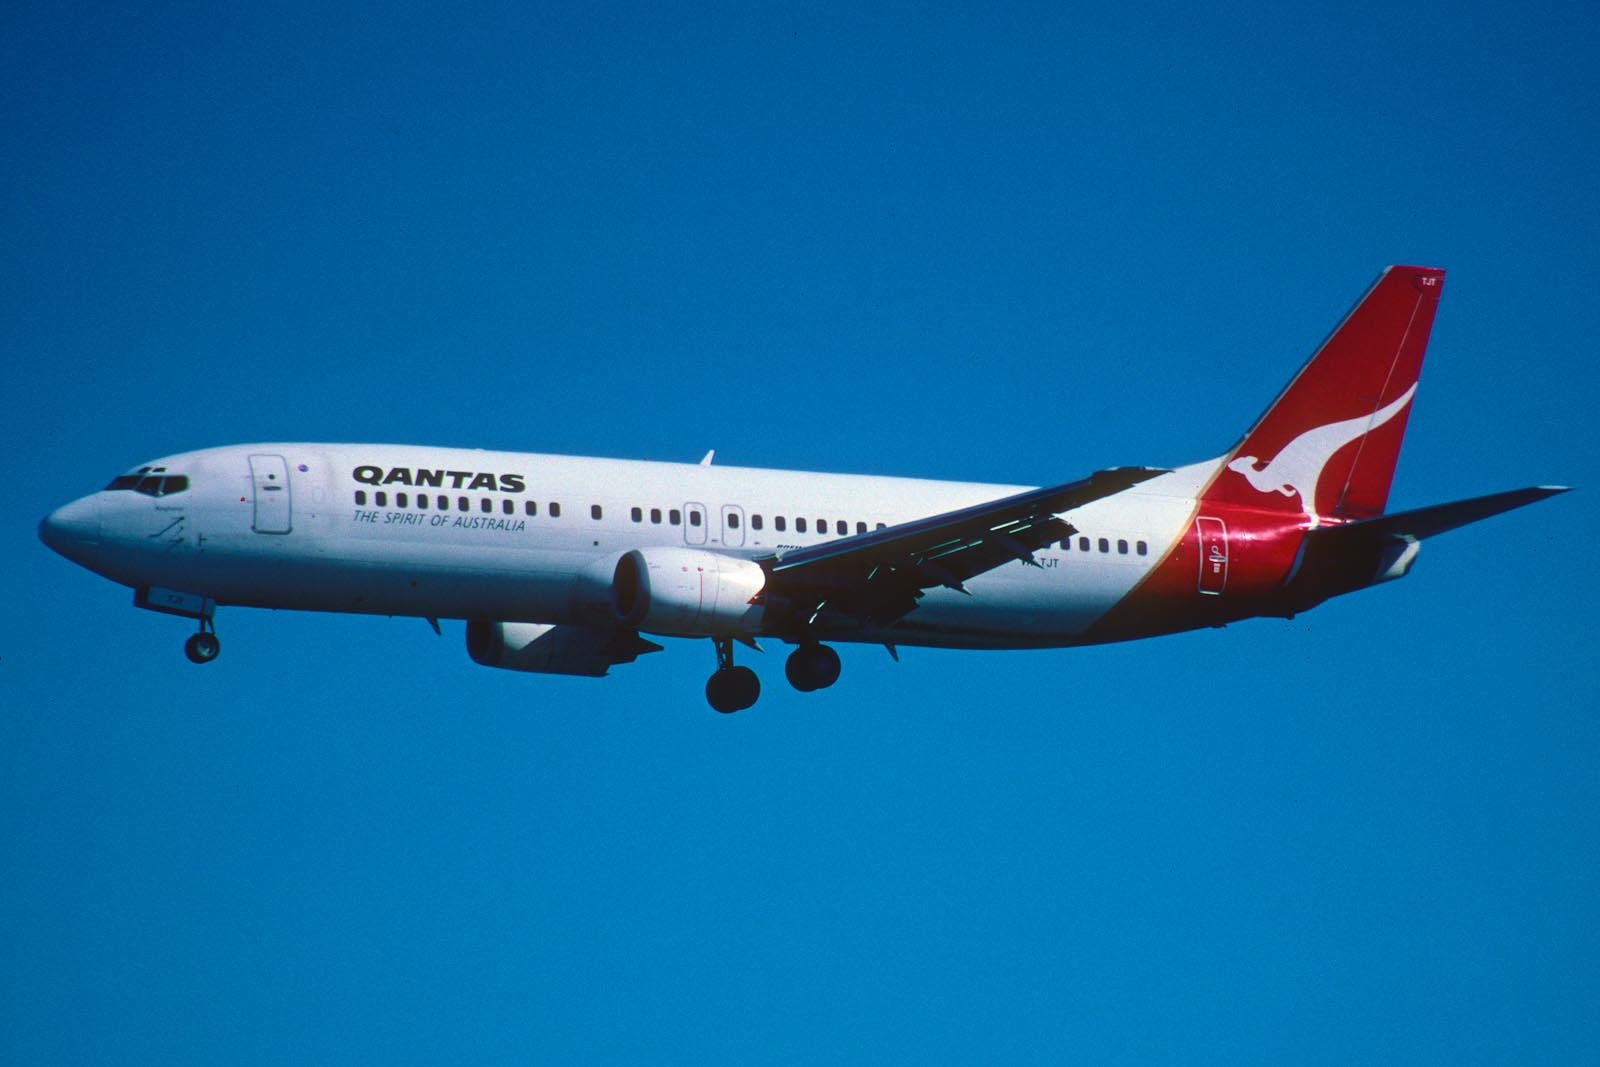 Qantas plane | YWAM Sydney, Newtown | Australia